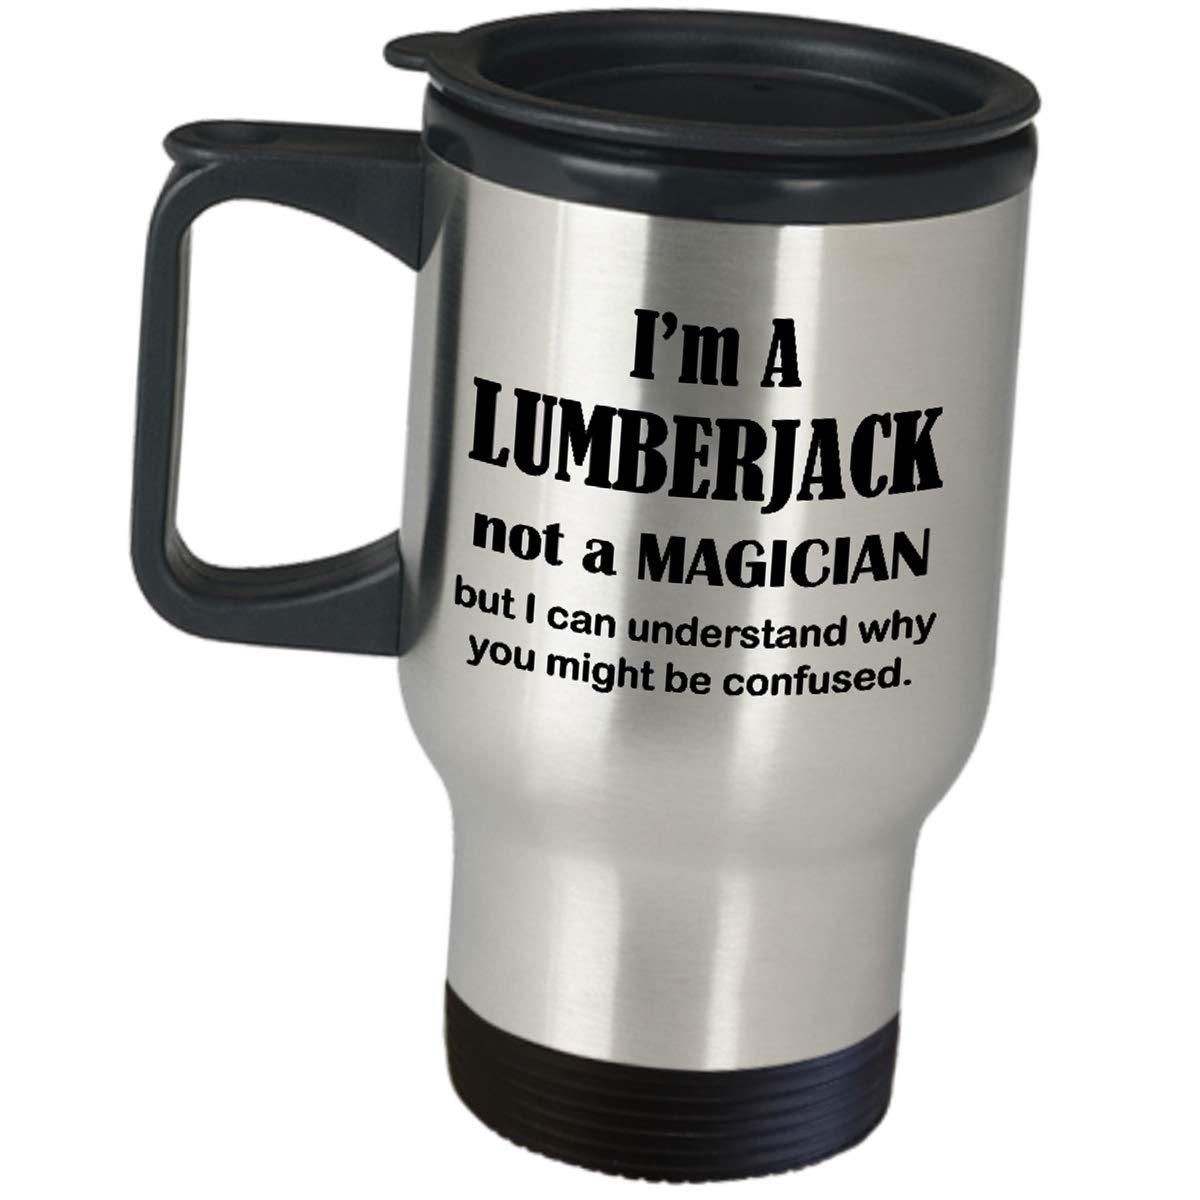 Travel Mug Appreciation Gift for Lumberjack - I Am Not A Magician - Men Women Logging Wood Tree Log Hog Coffee Tumbler Cool Trucker Truck Catty River Timber Cutter Lumberjill Funny Cute Gag